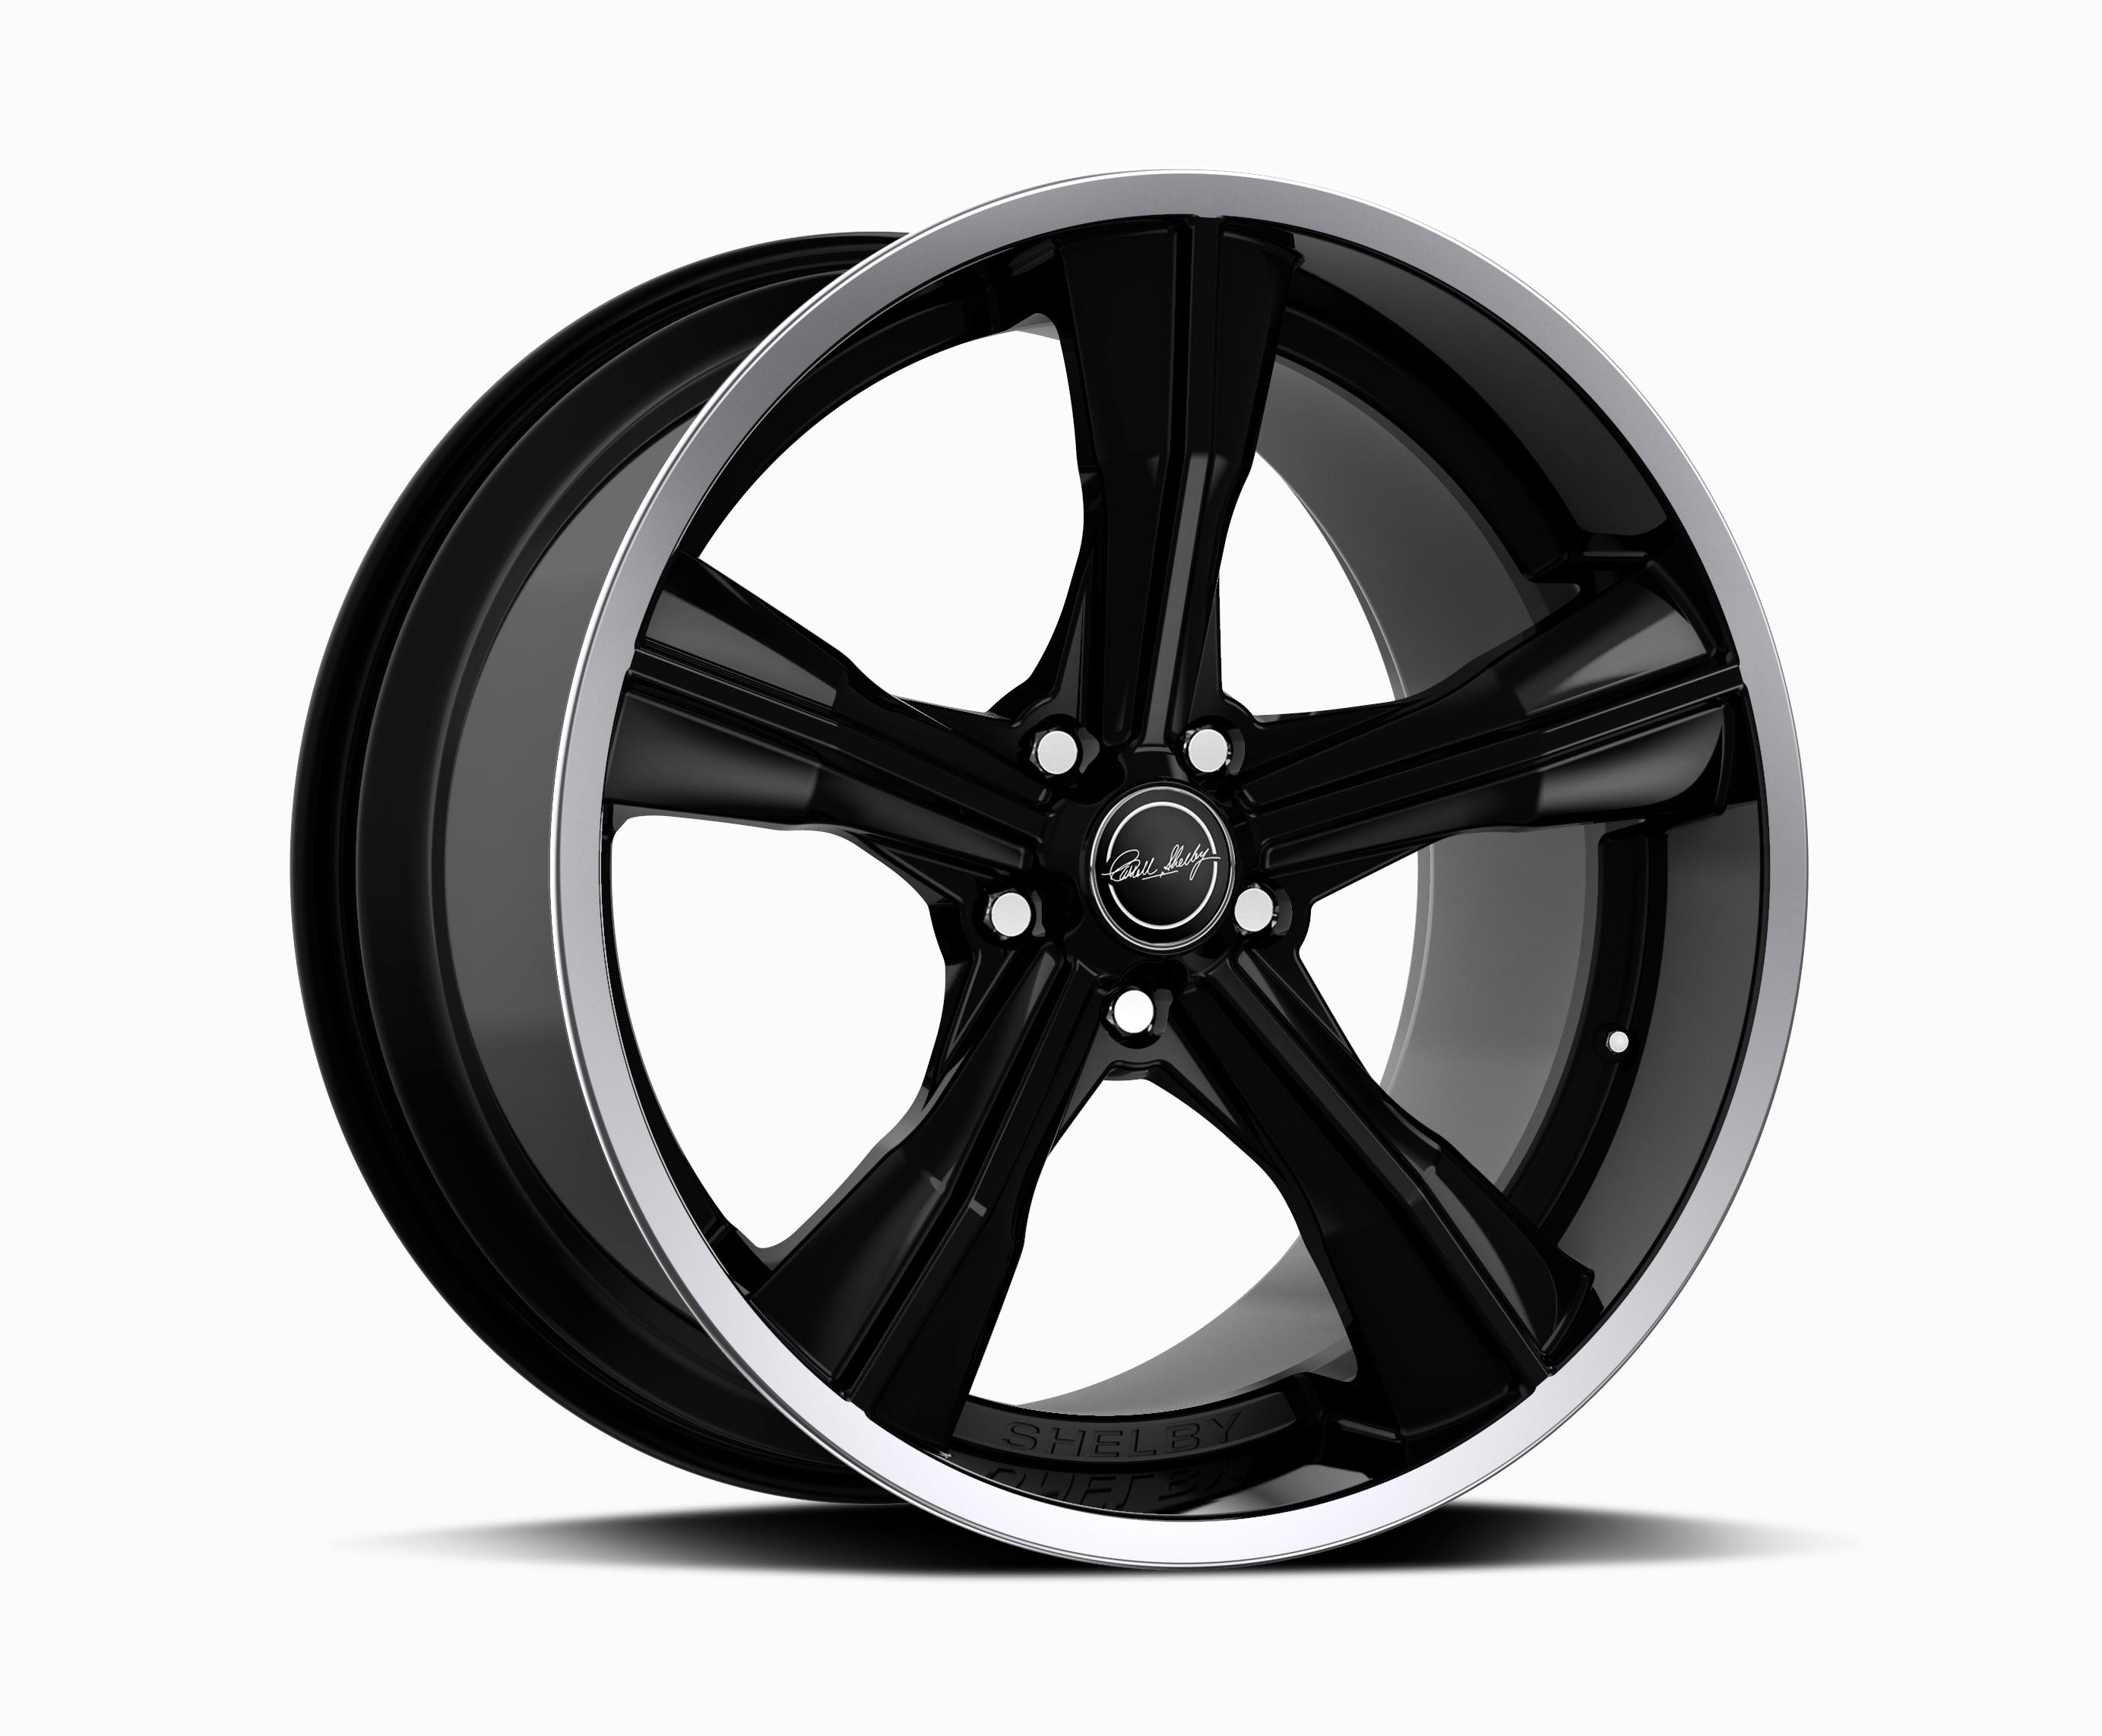 Carroll Shelby Wheels CS 11 - Black w/Polished Lip Rim